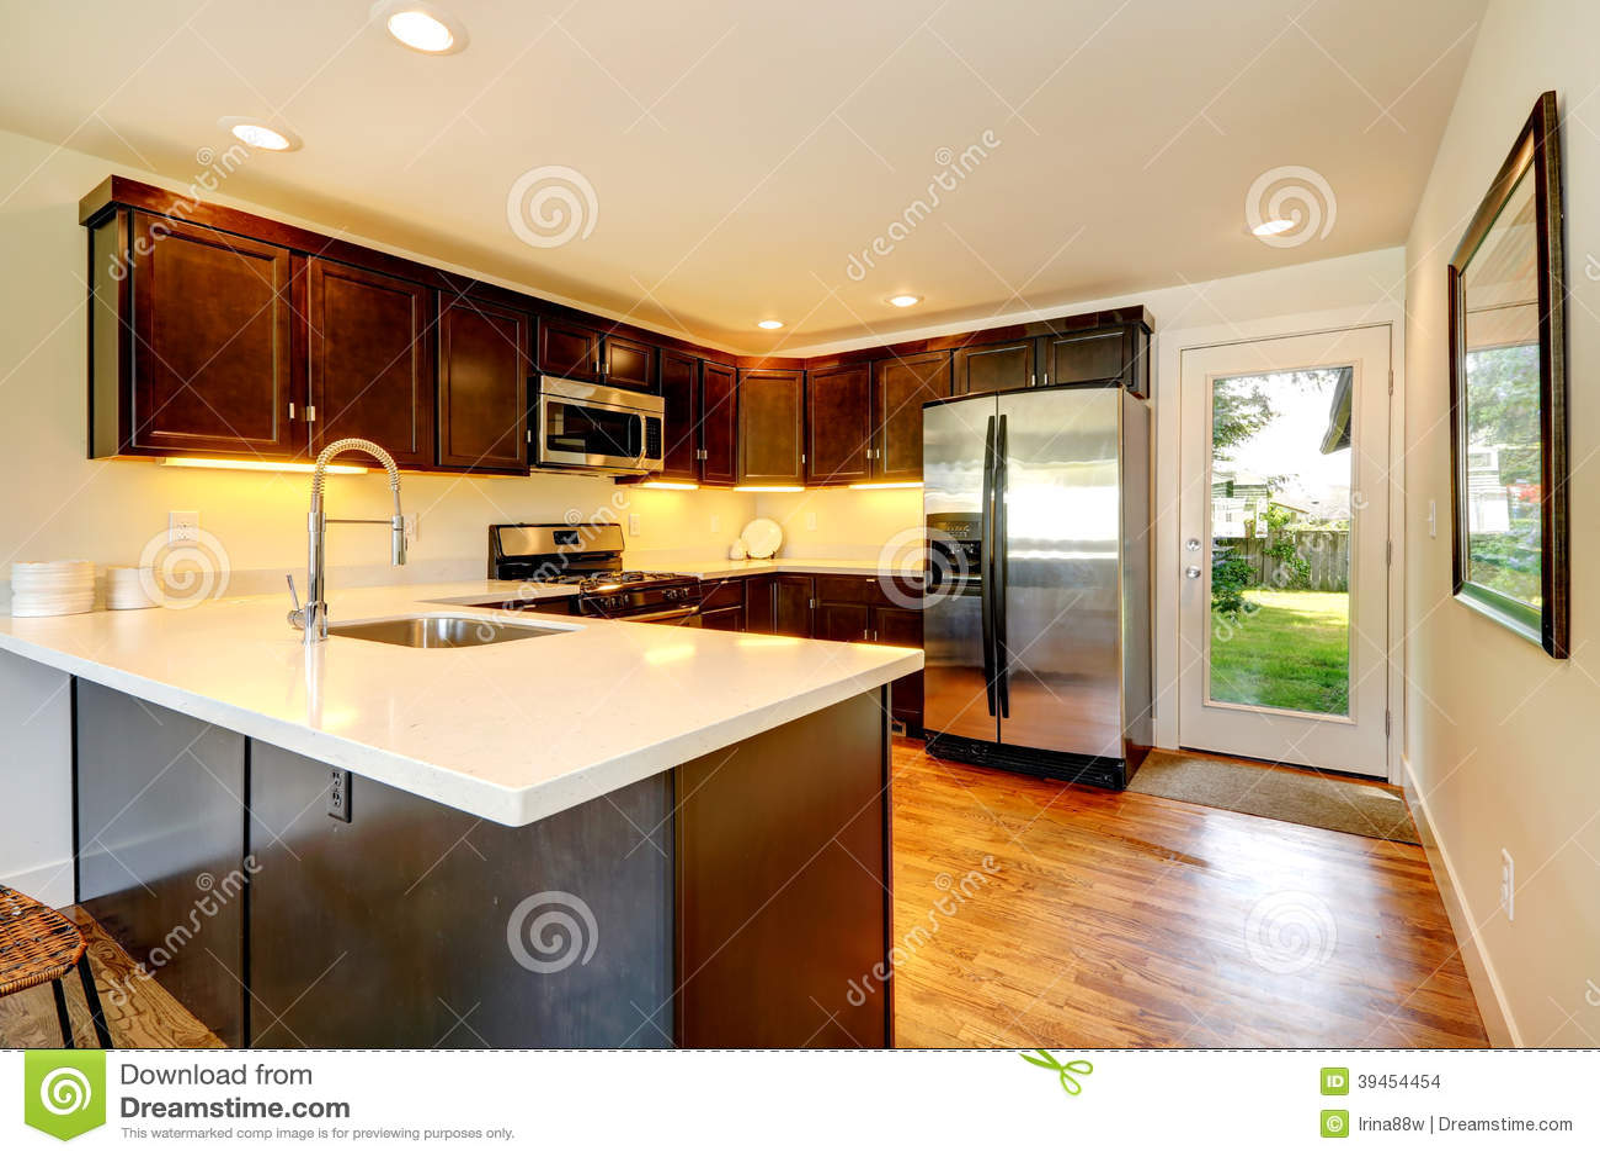 backyard kitchen designs stainless steel faucet with pull down spray 巧克力颜色有门的厨房室对后院库存照片 图片包括有厨房 设计 实际 巧克力颜色有门的厨房室对后院